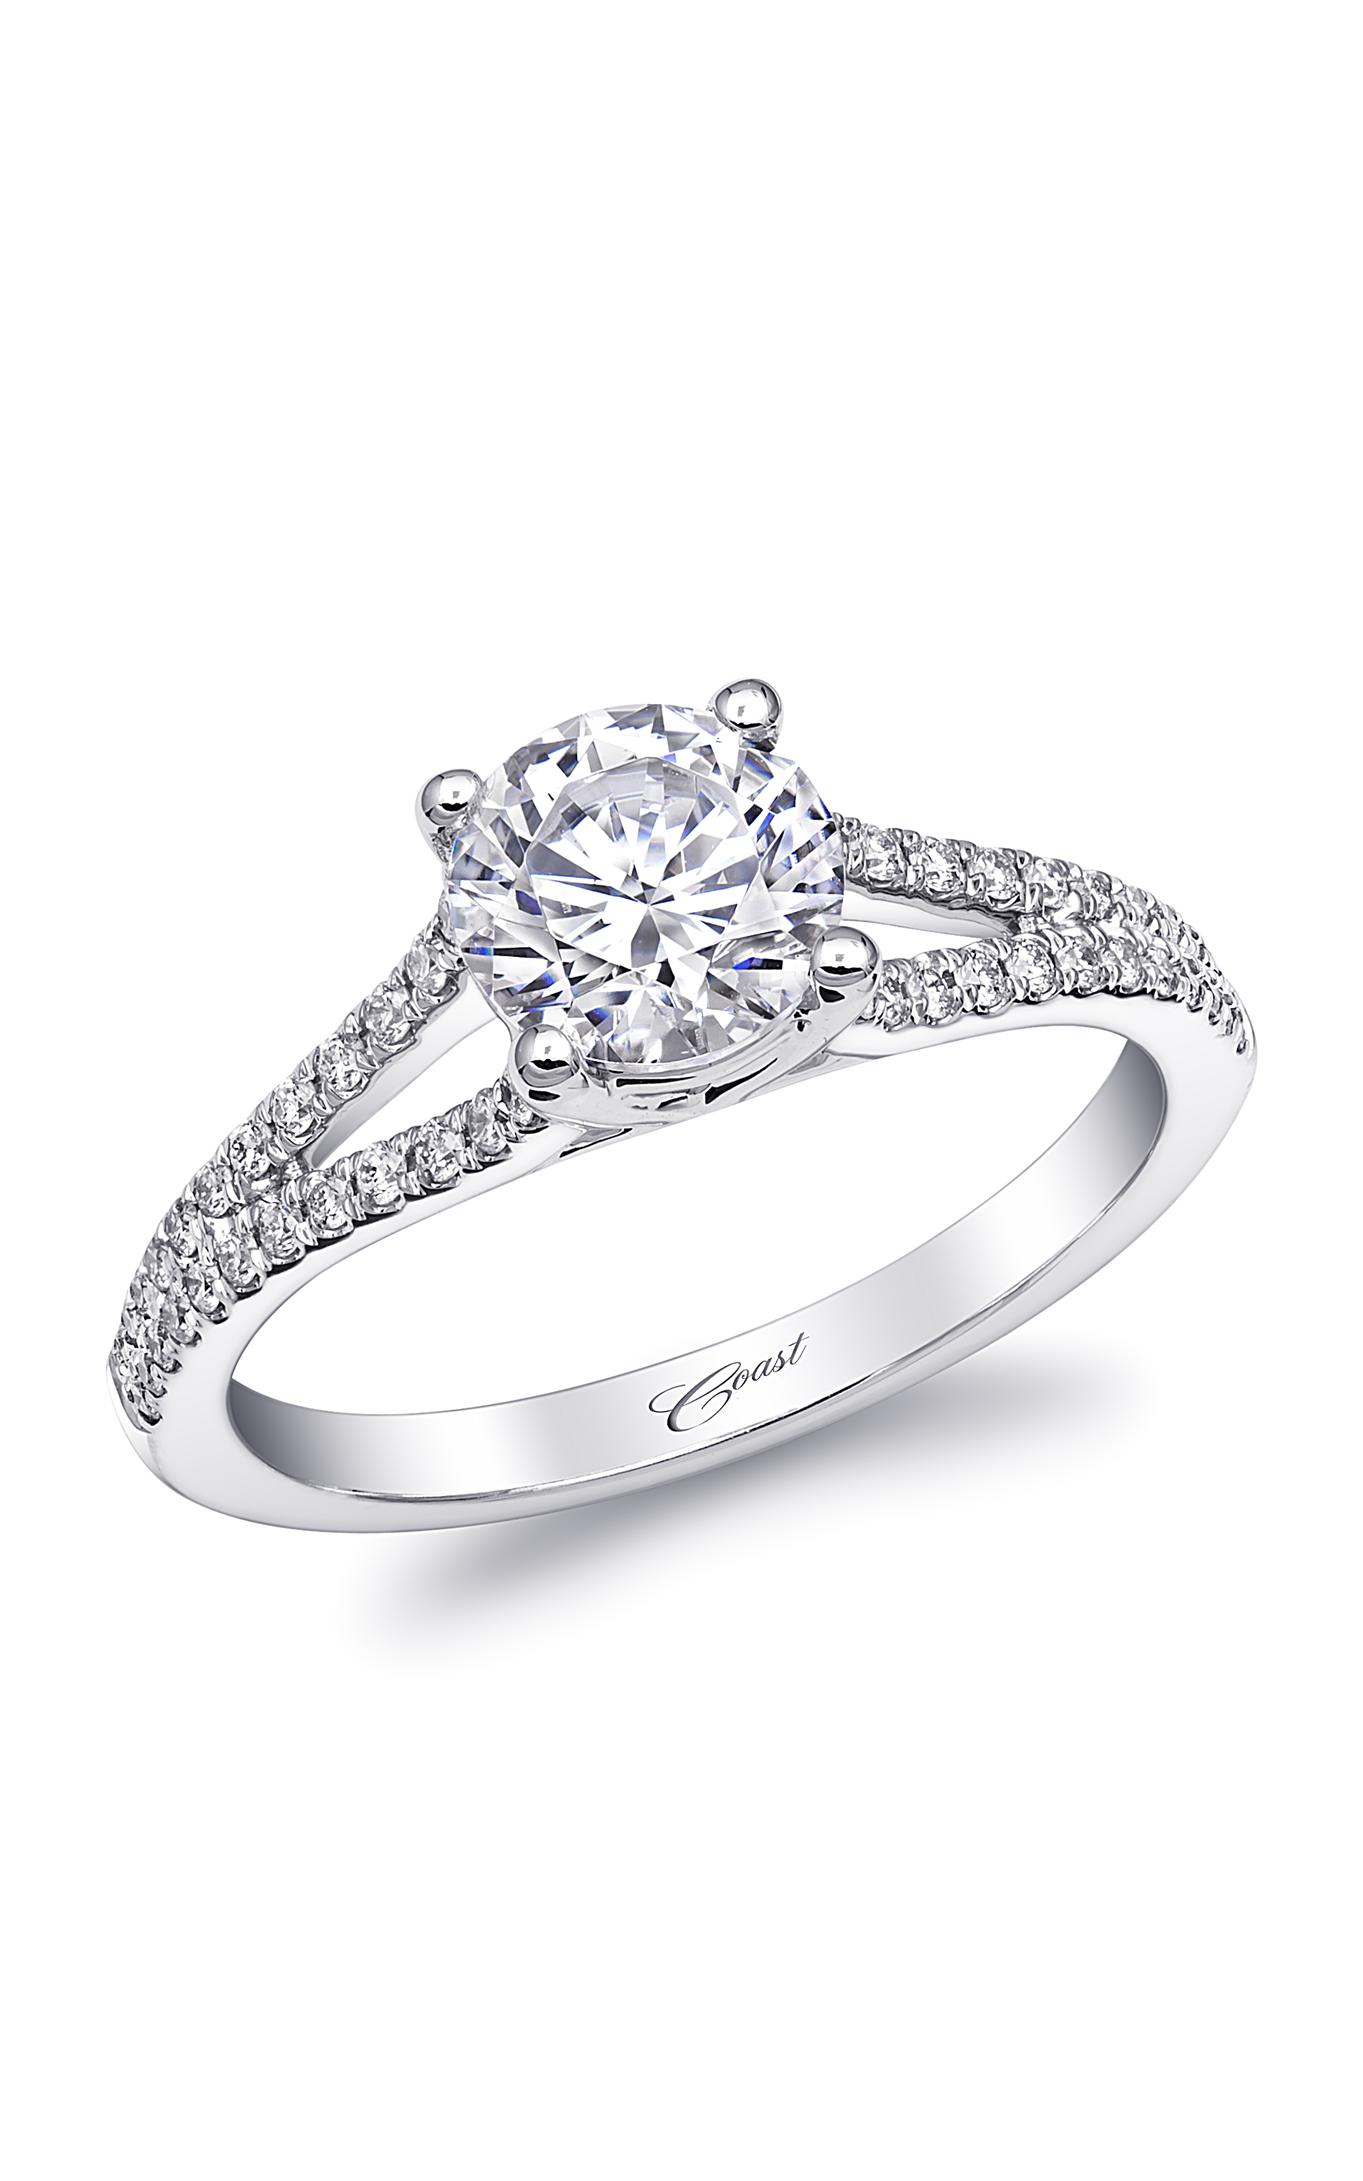 Coast Diamond Charisma LC10120 product image